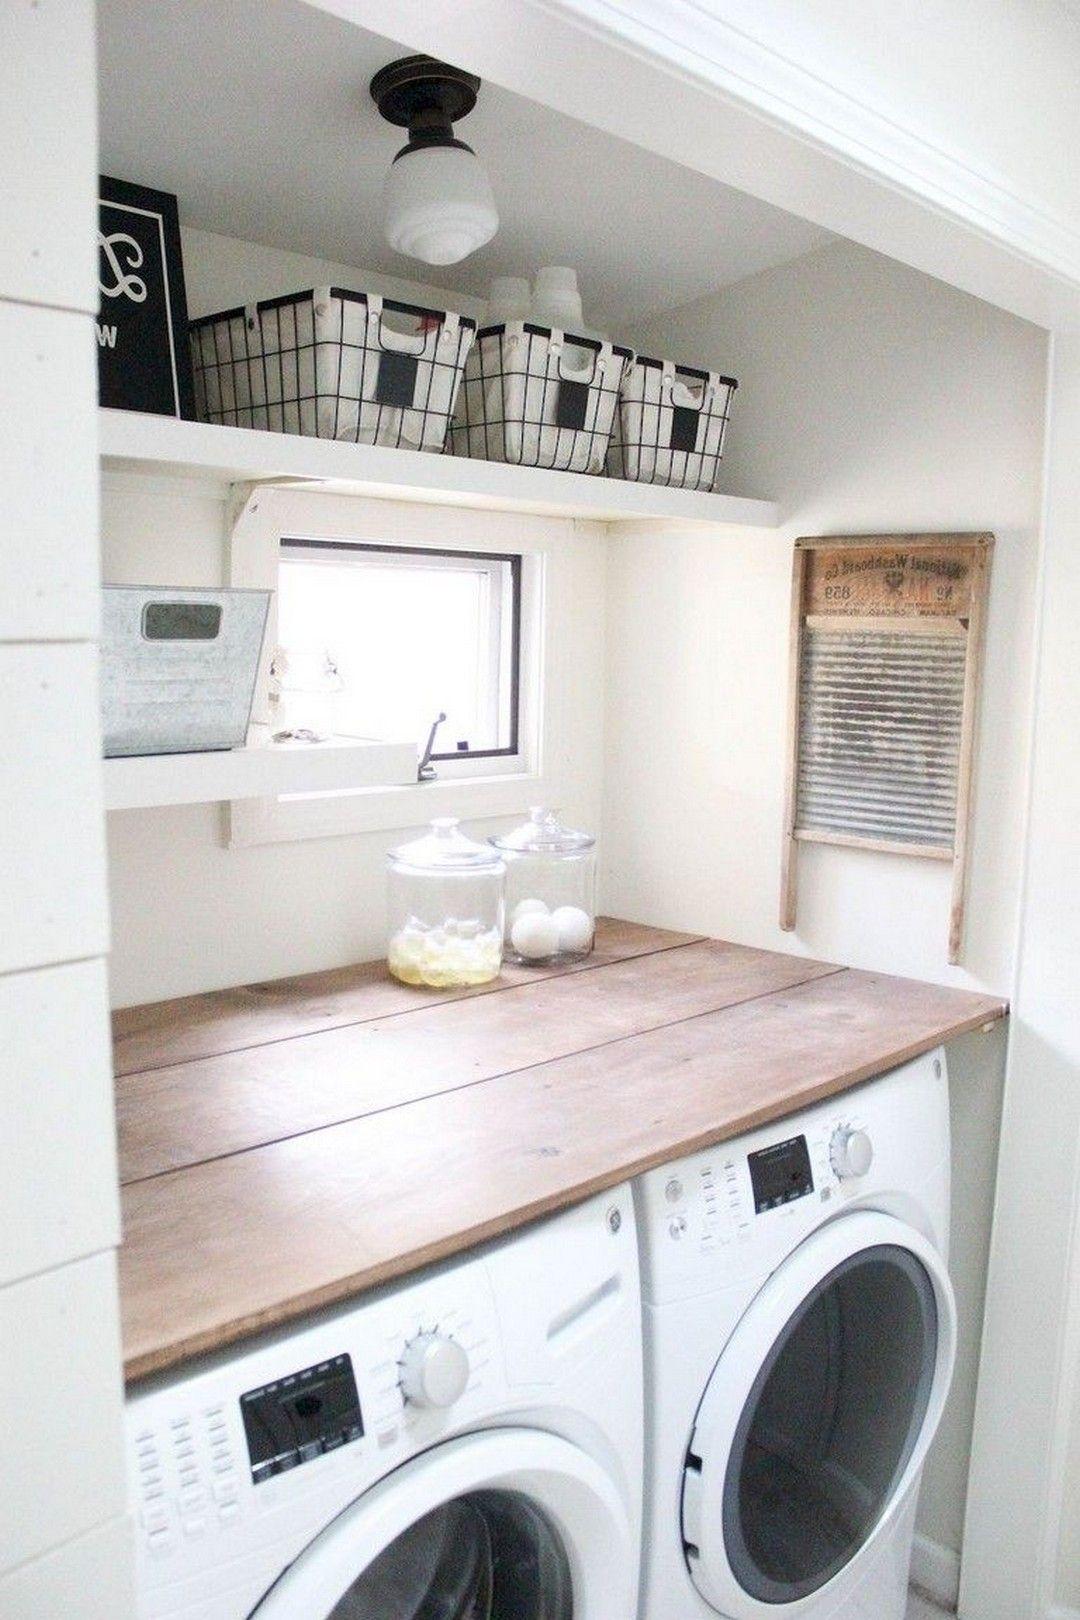 34 Laundry Storage And Organization Ideas images